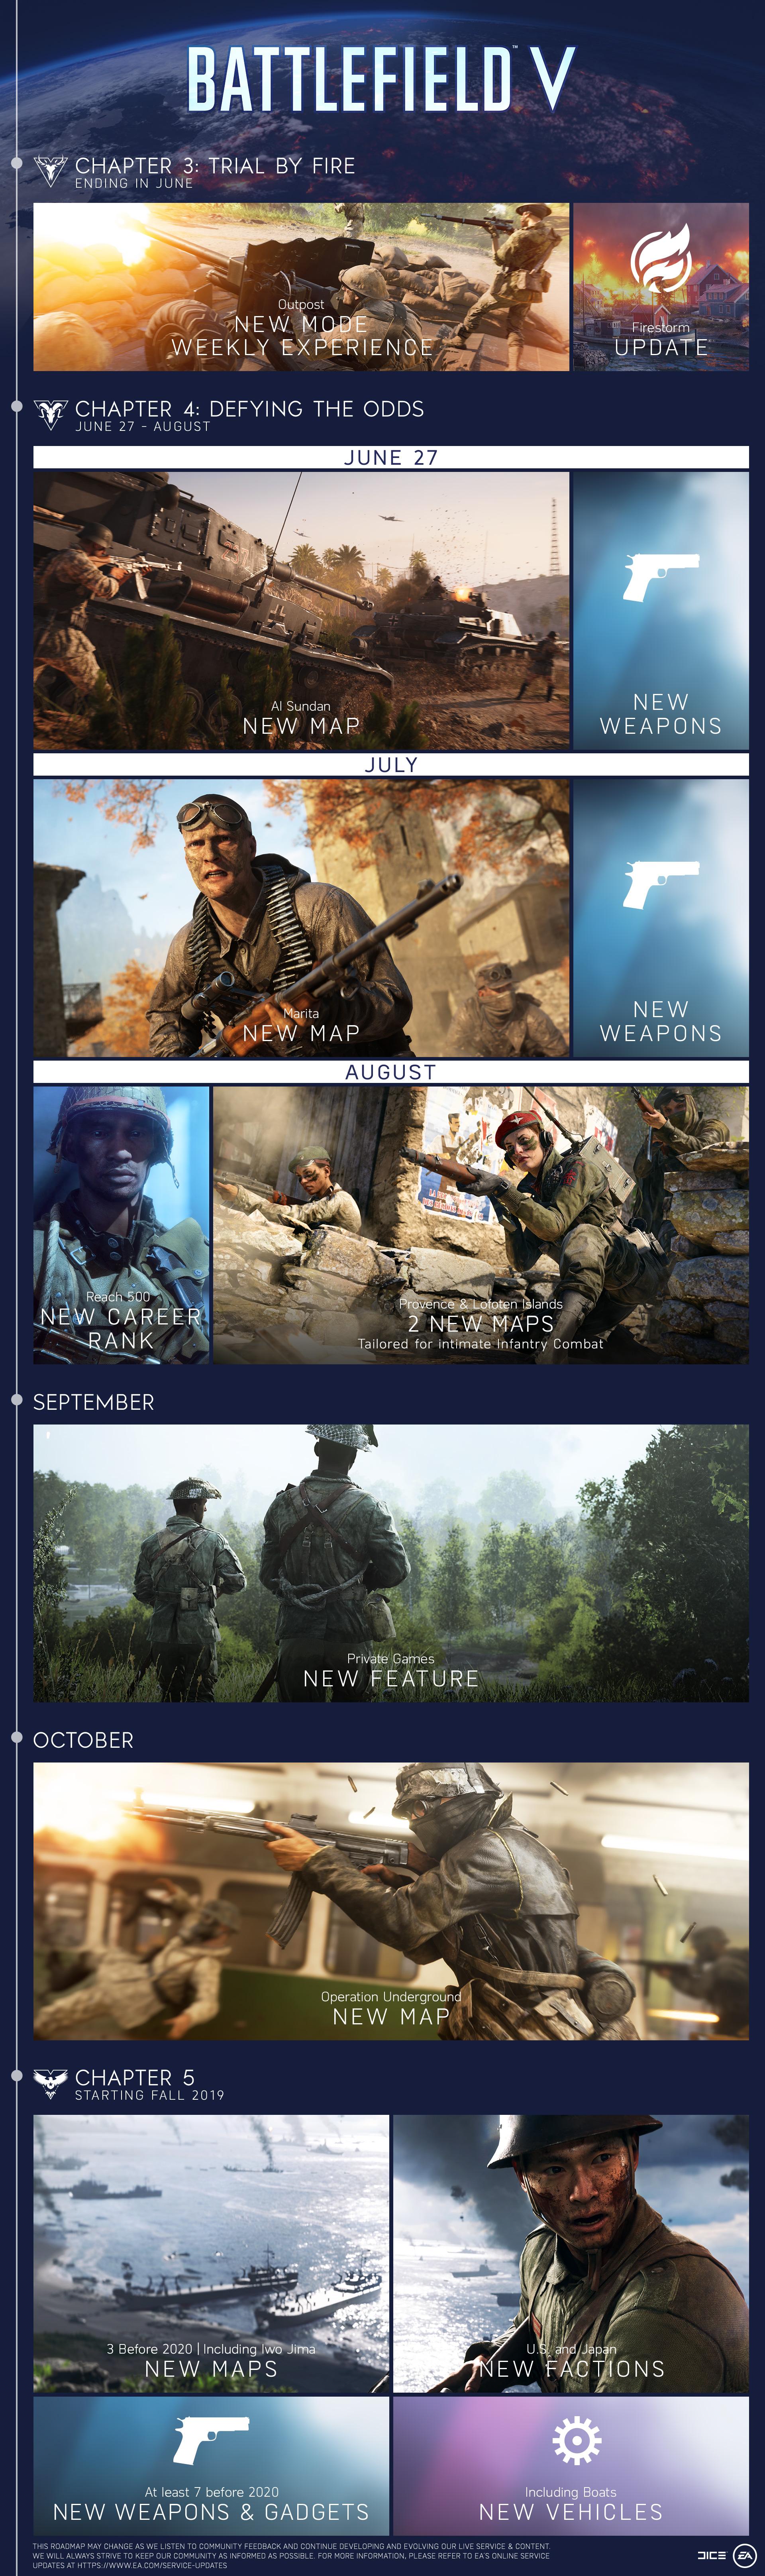 Overzicht aankomende Battlefield 5 updates